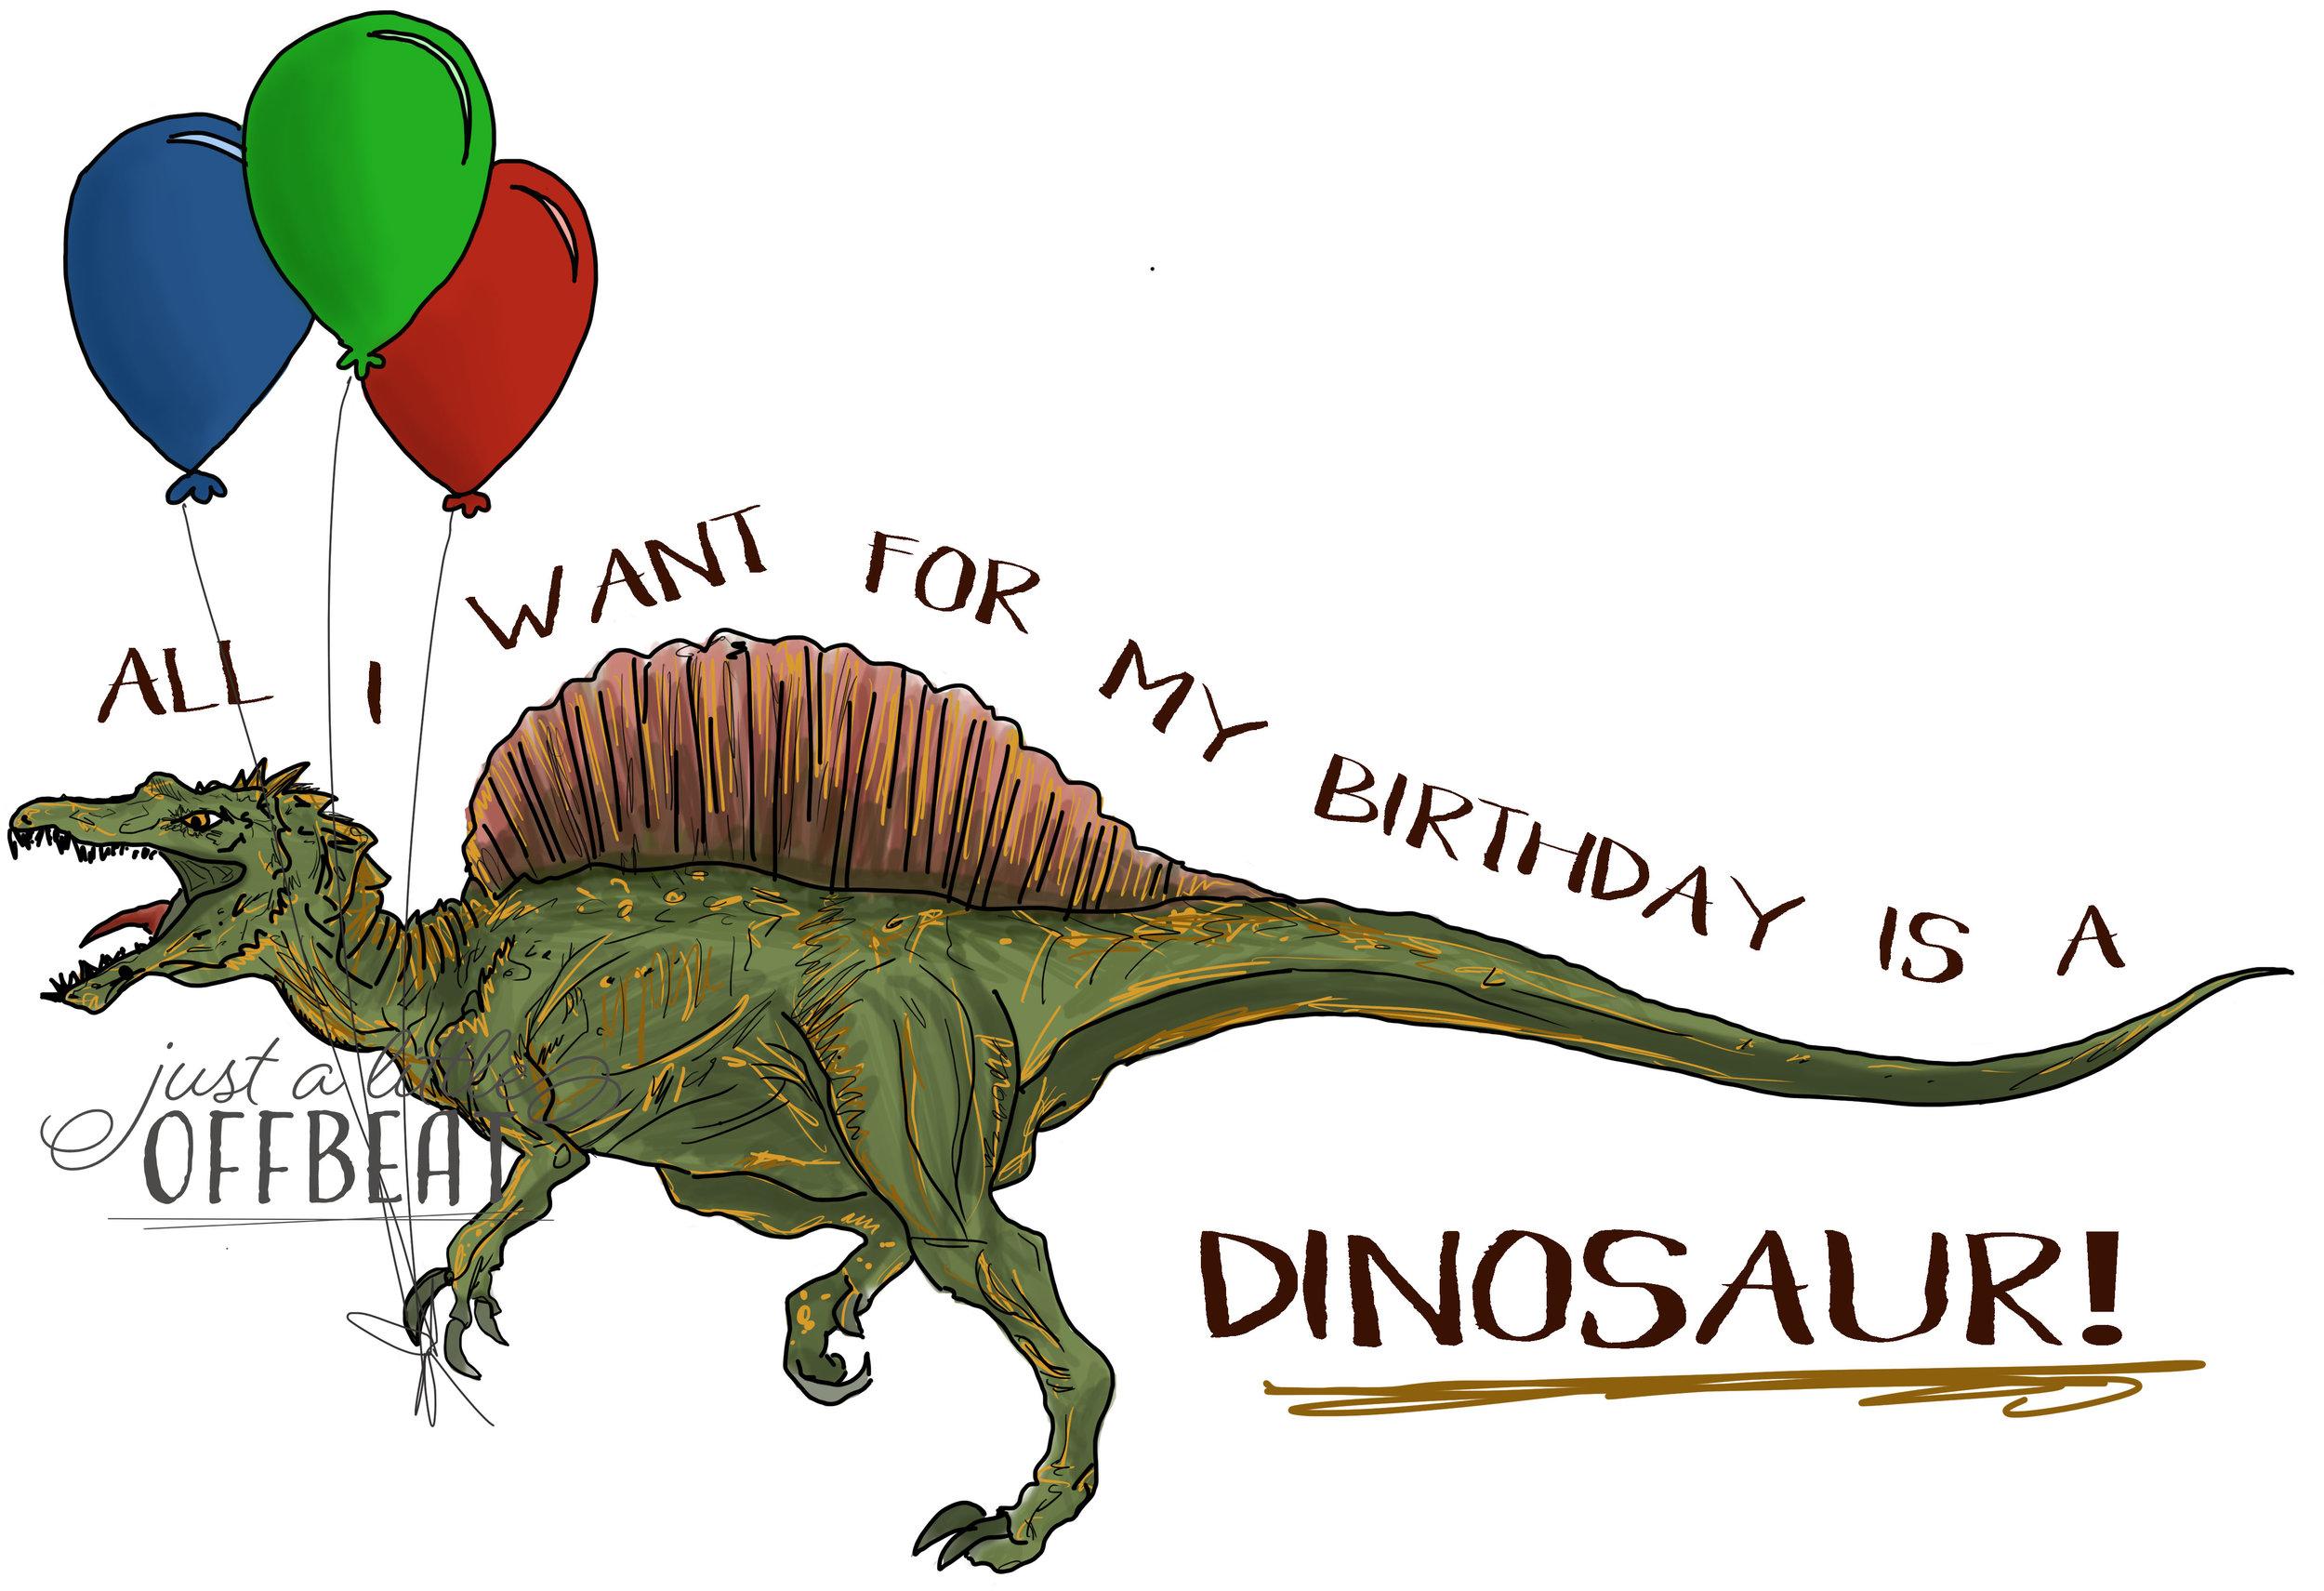 Dino Birthday Shirt.jpg